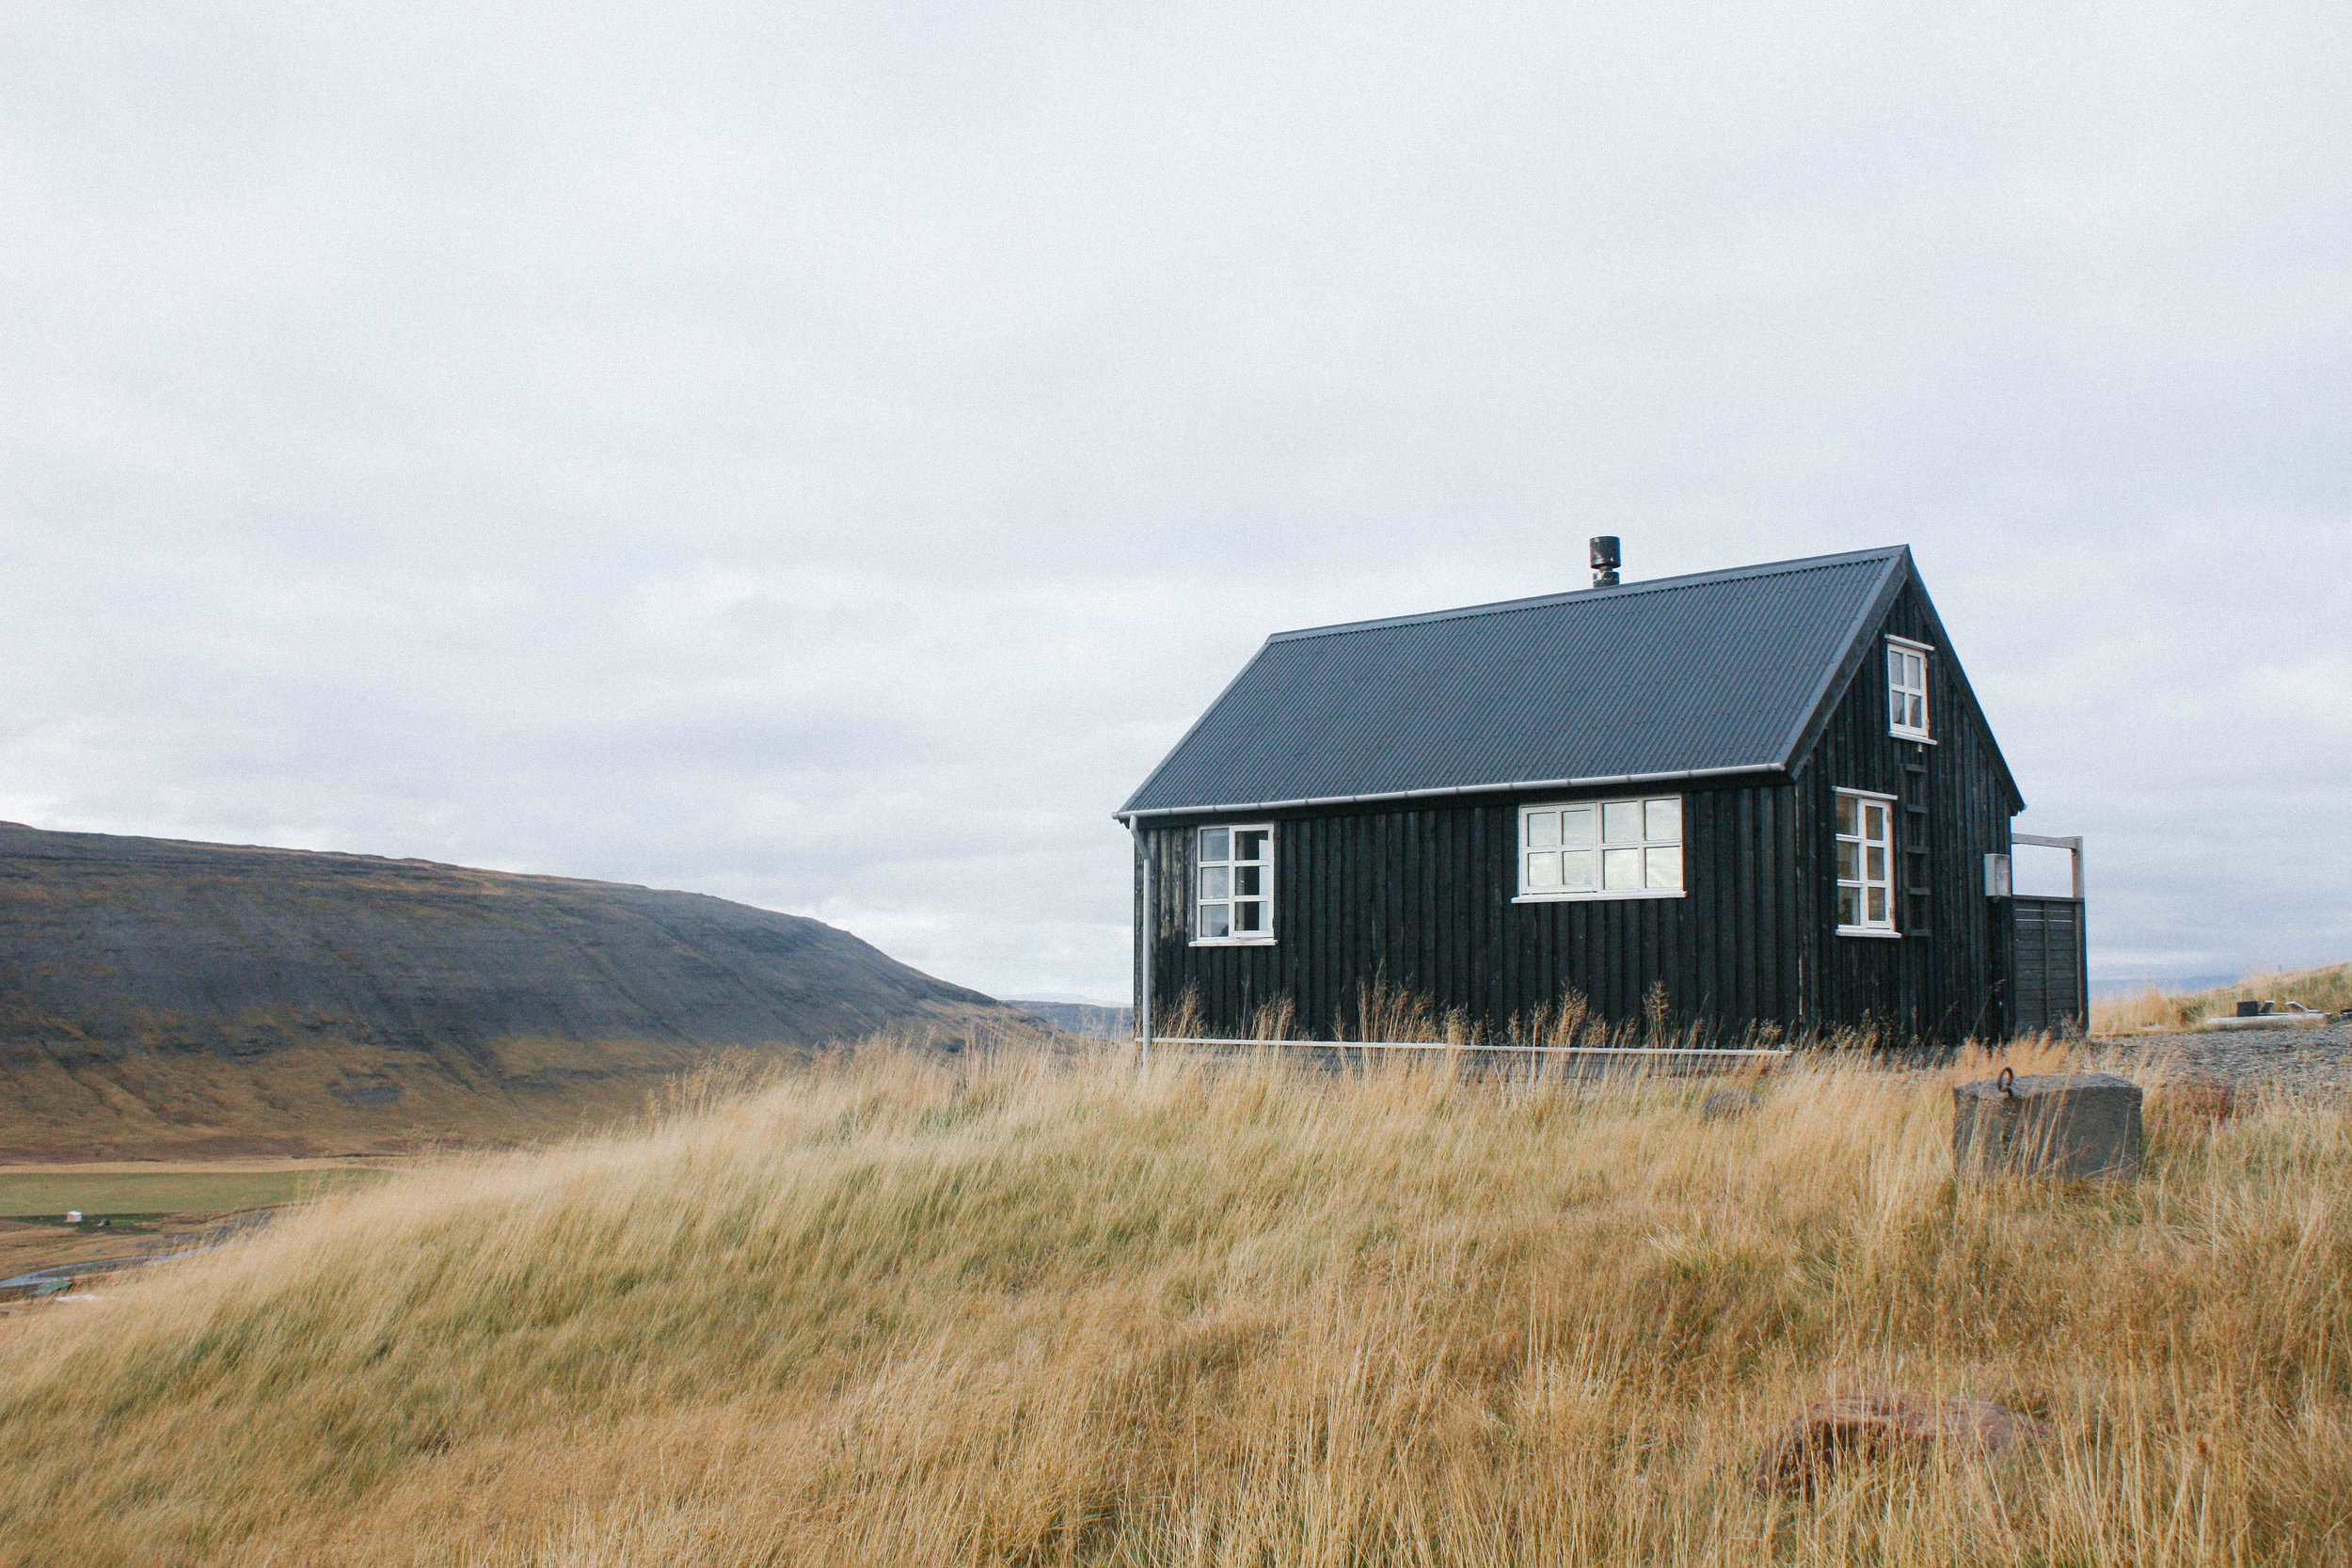 cabinonahill2.jpg